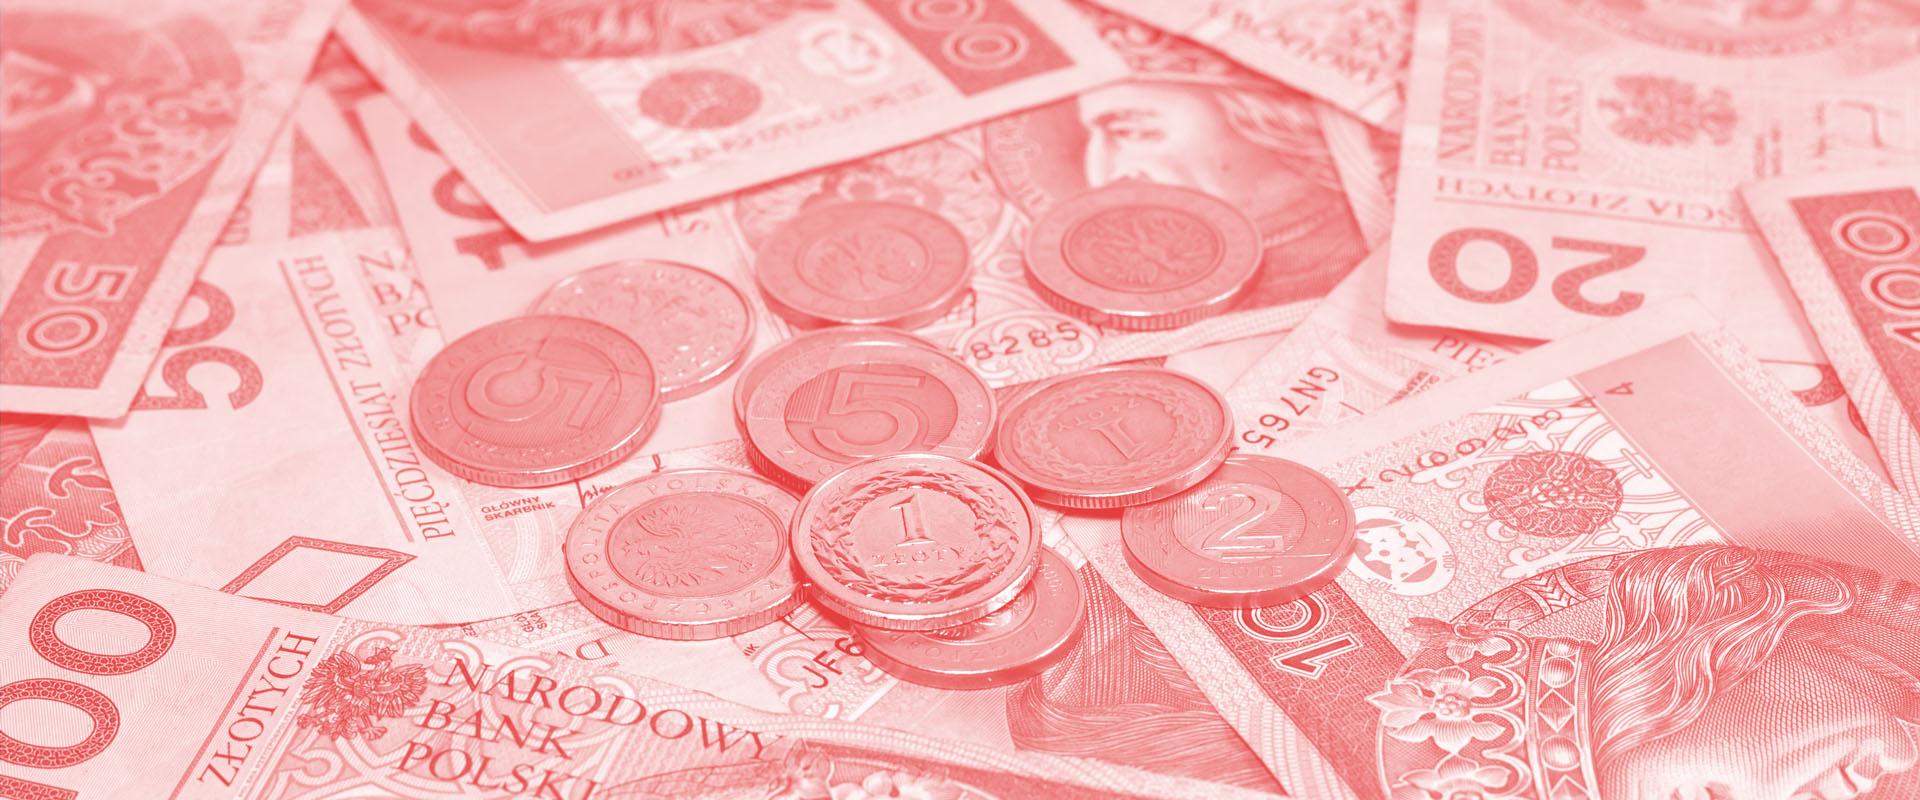 Polish zoty symbol the dialogue buycottarizona Image collections